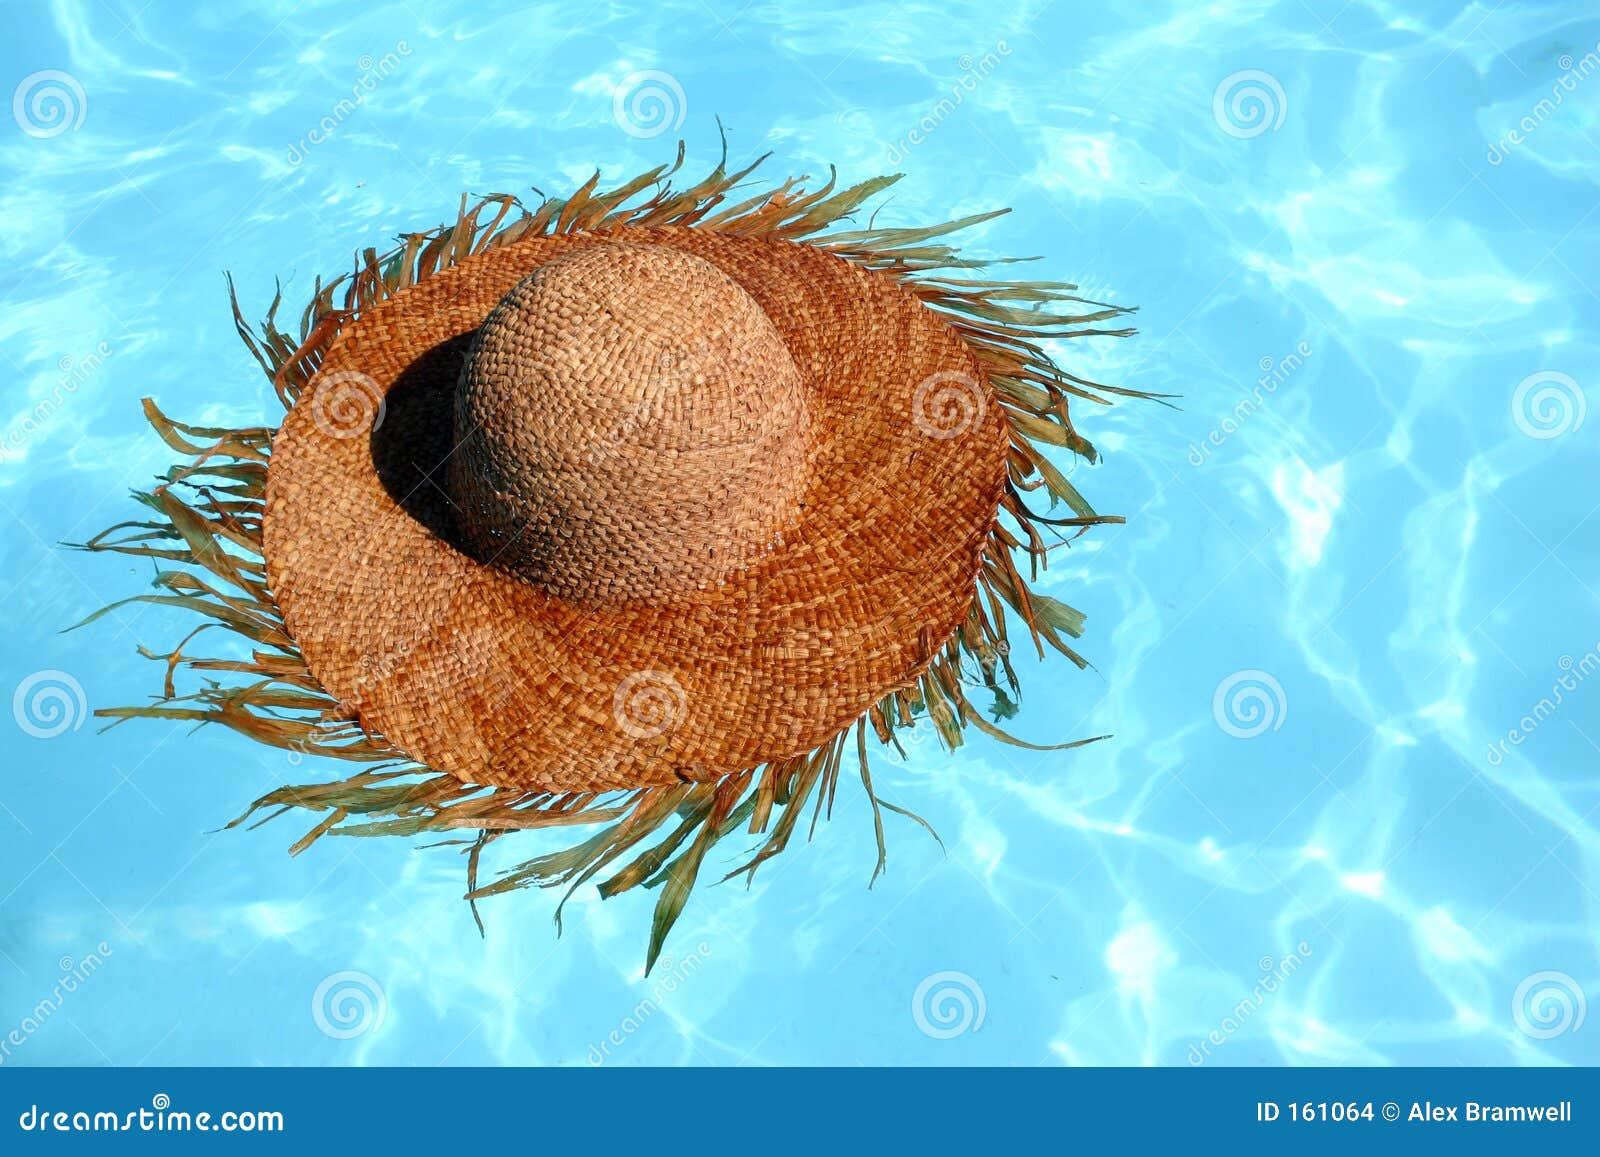 Straw Hat Floating